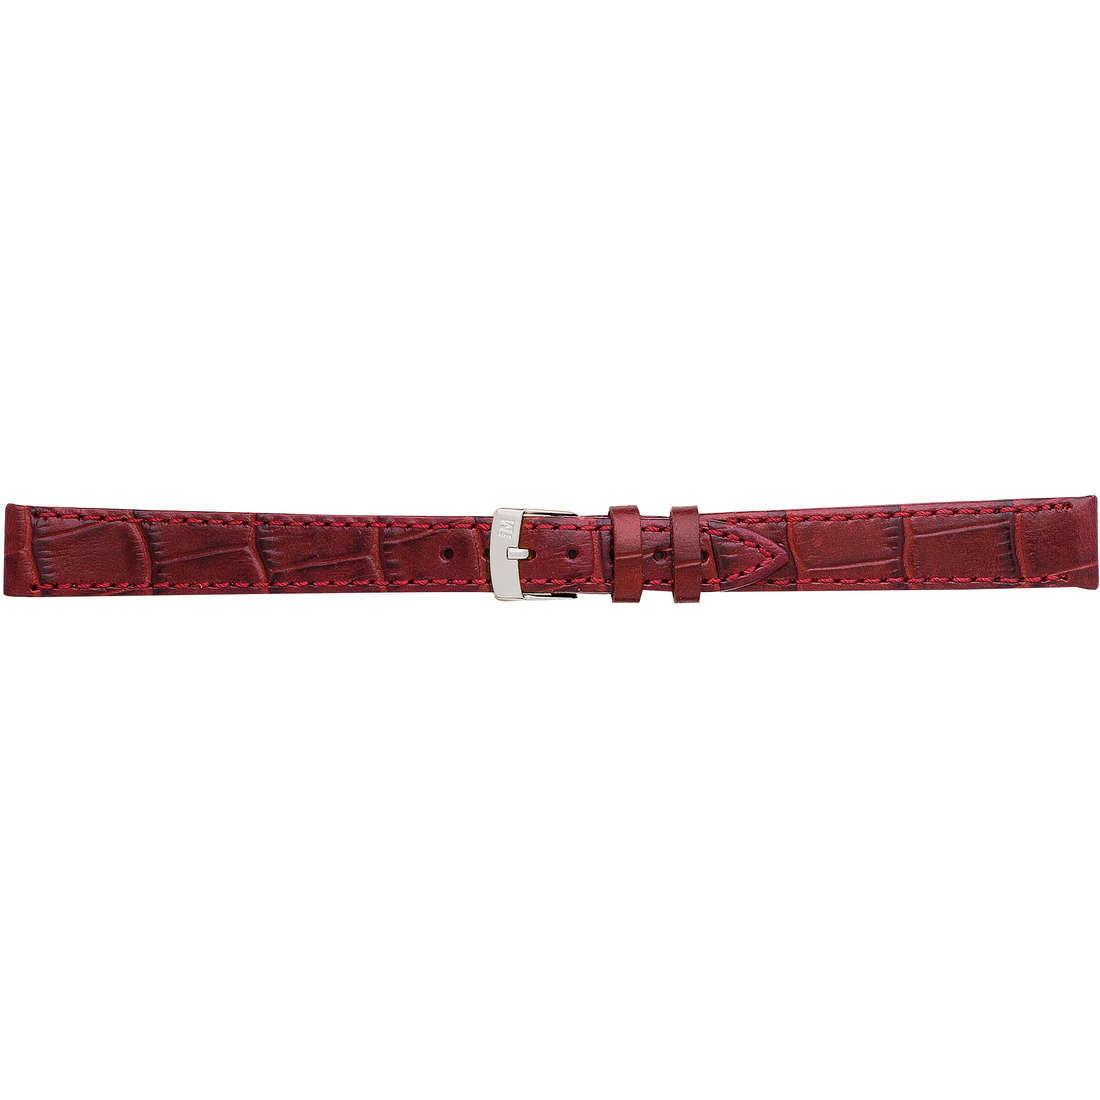 montre bande de montres unisex Morellato I Lunghi A01Y2524656081CR16